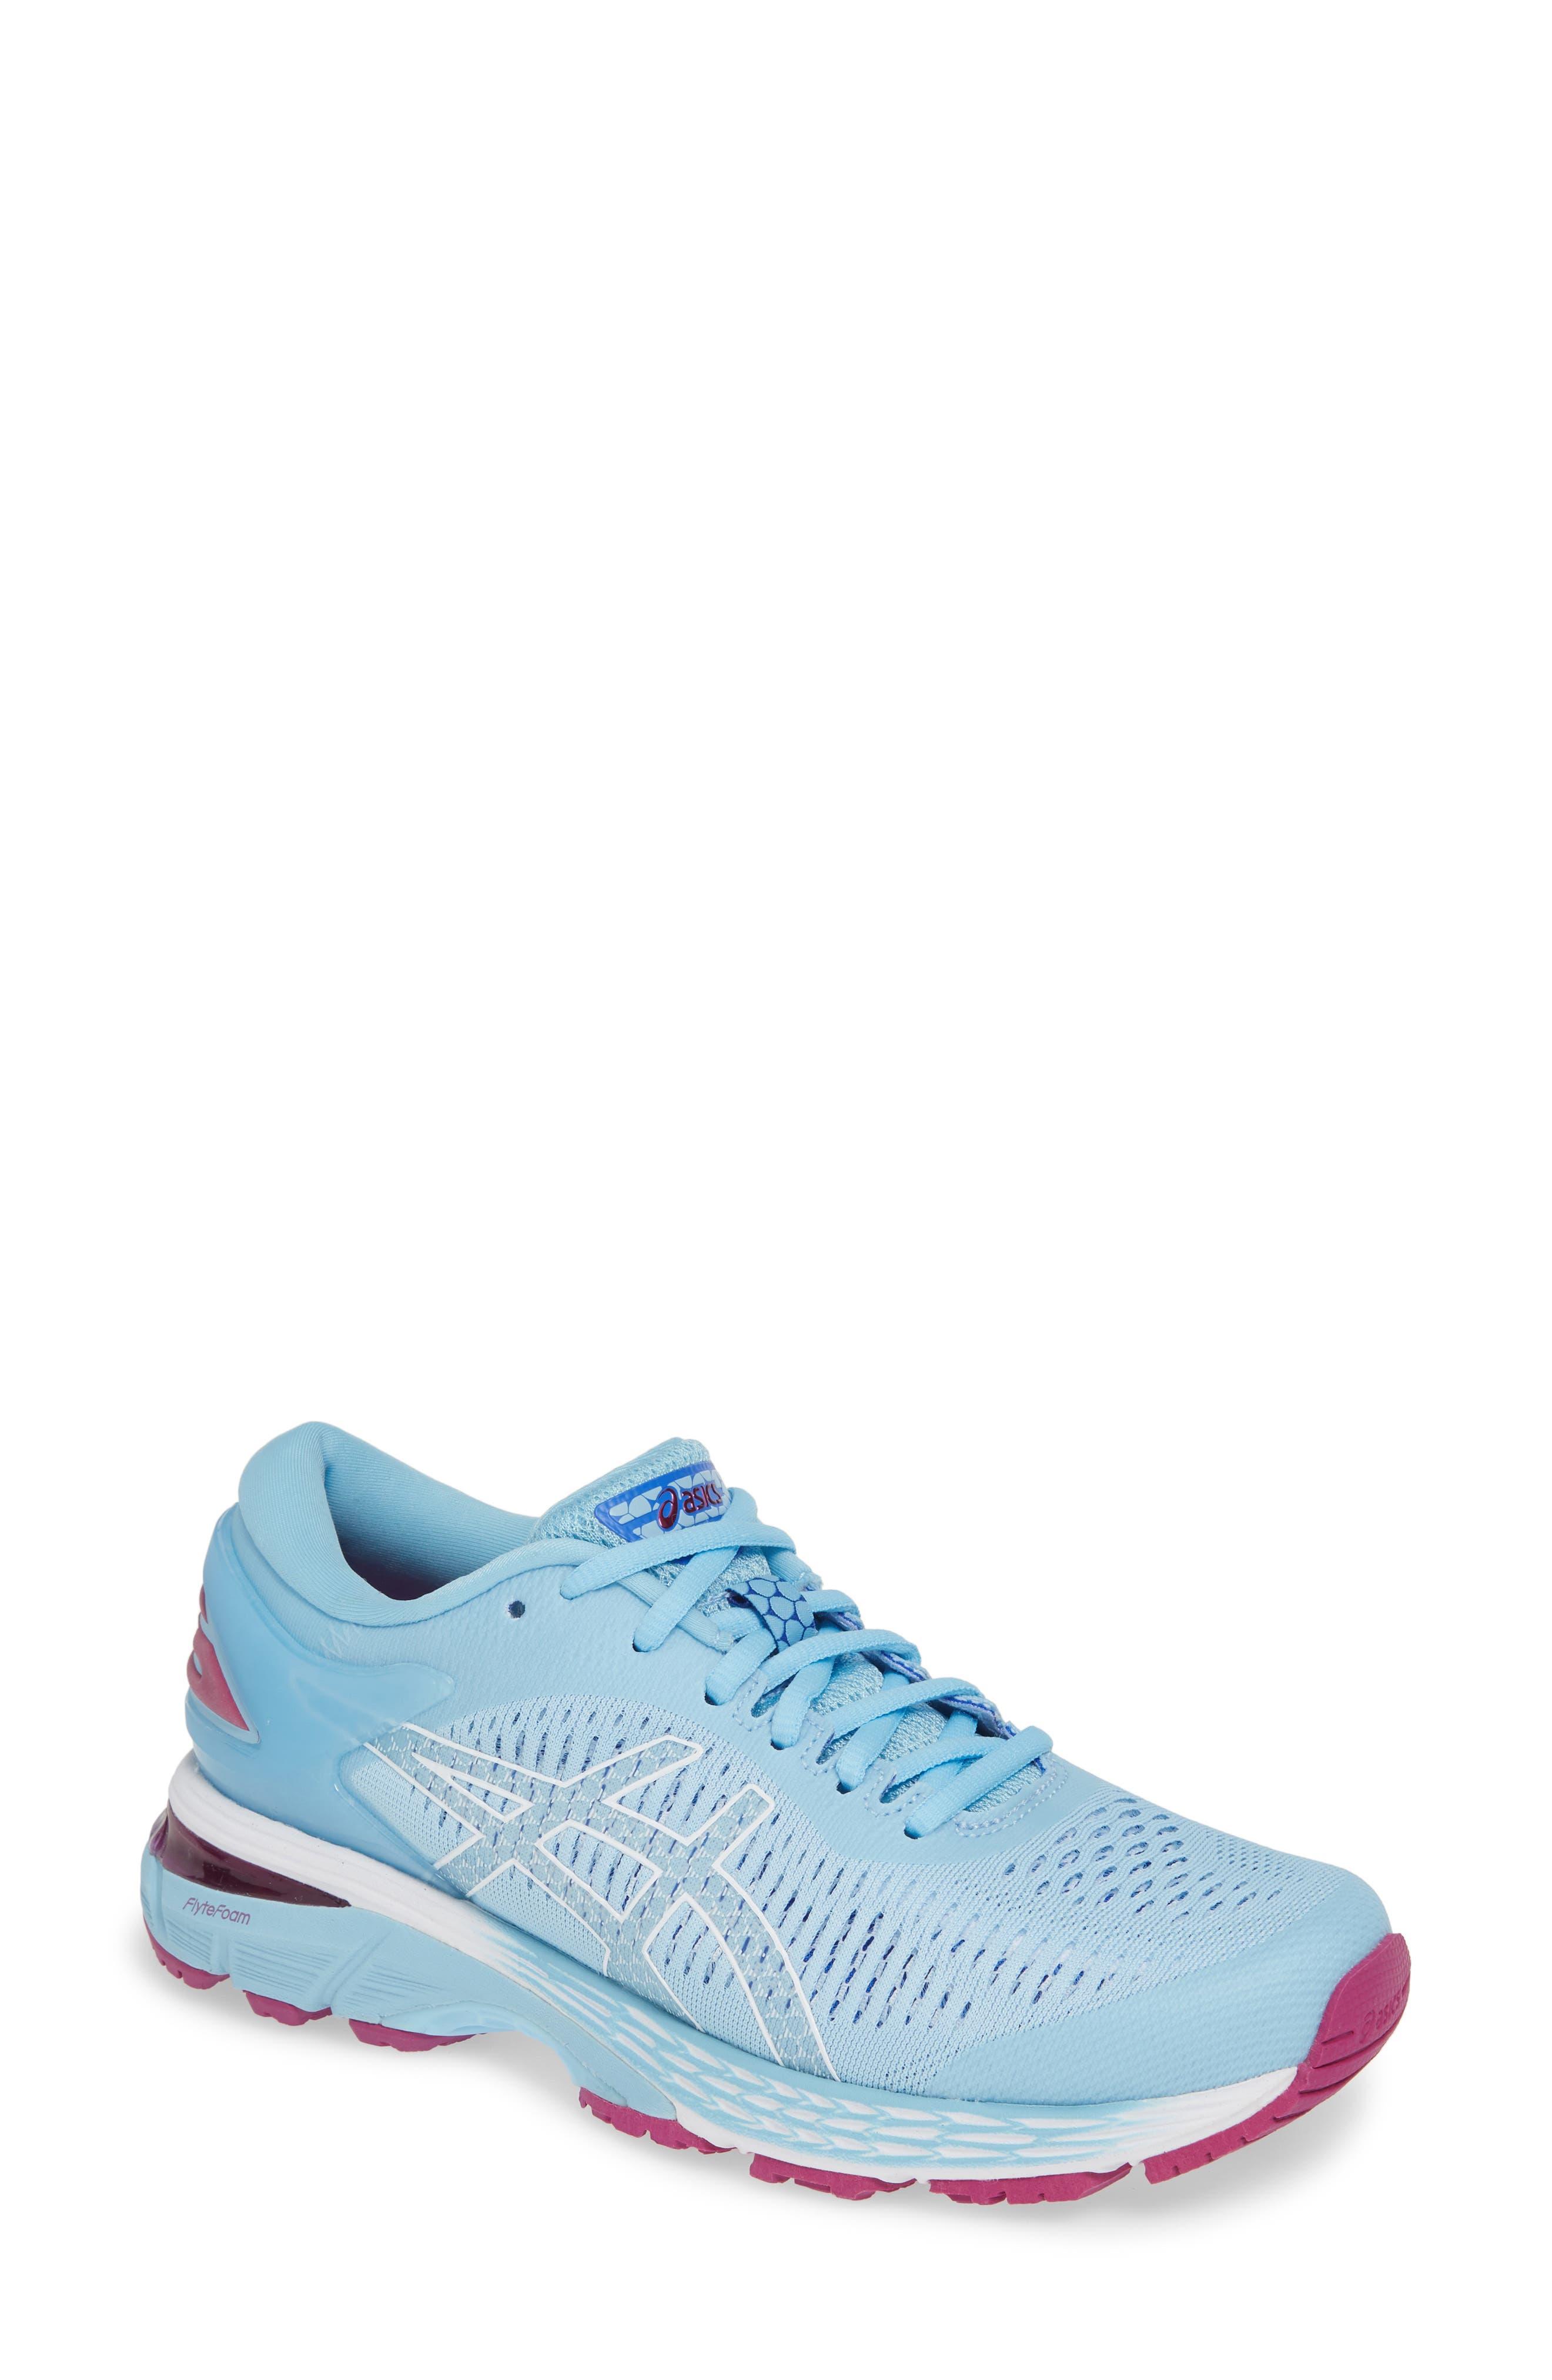 GEL-Kayano<sup>®</sup> 25 Running Shoe,                             Main thumbnail 1, color,                             SKYLIGHT/ ILLUSION BLUE